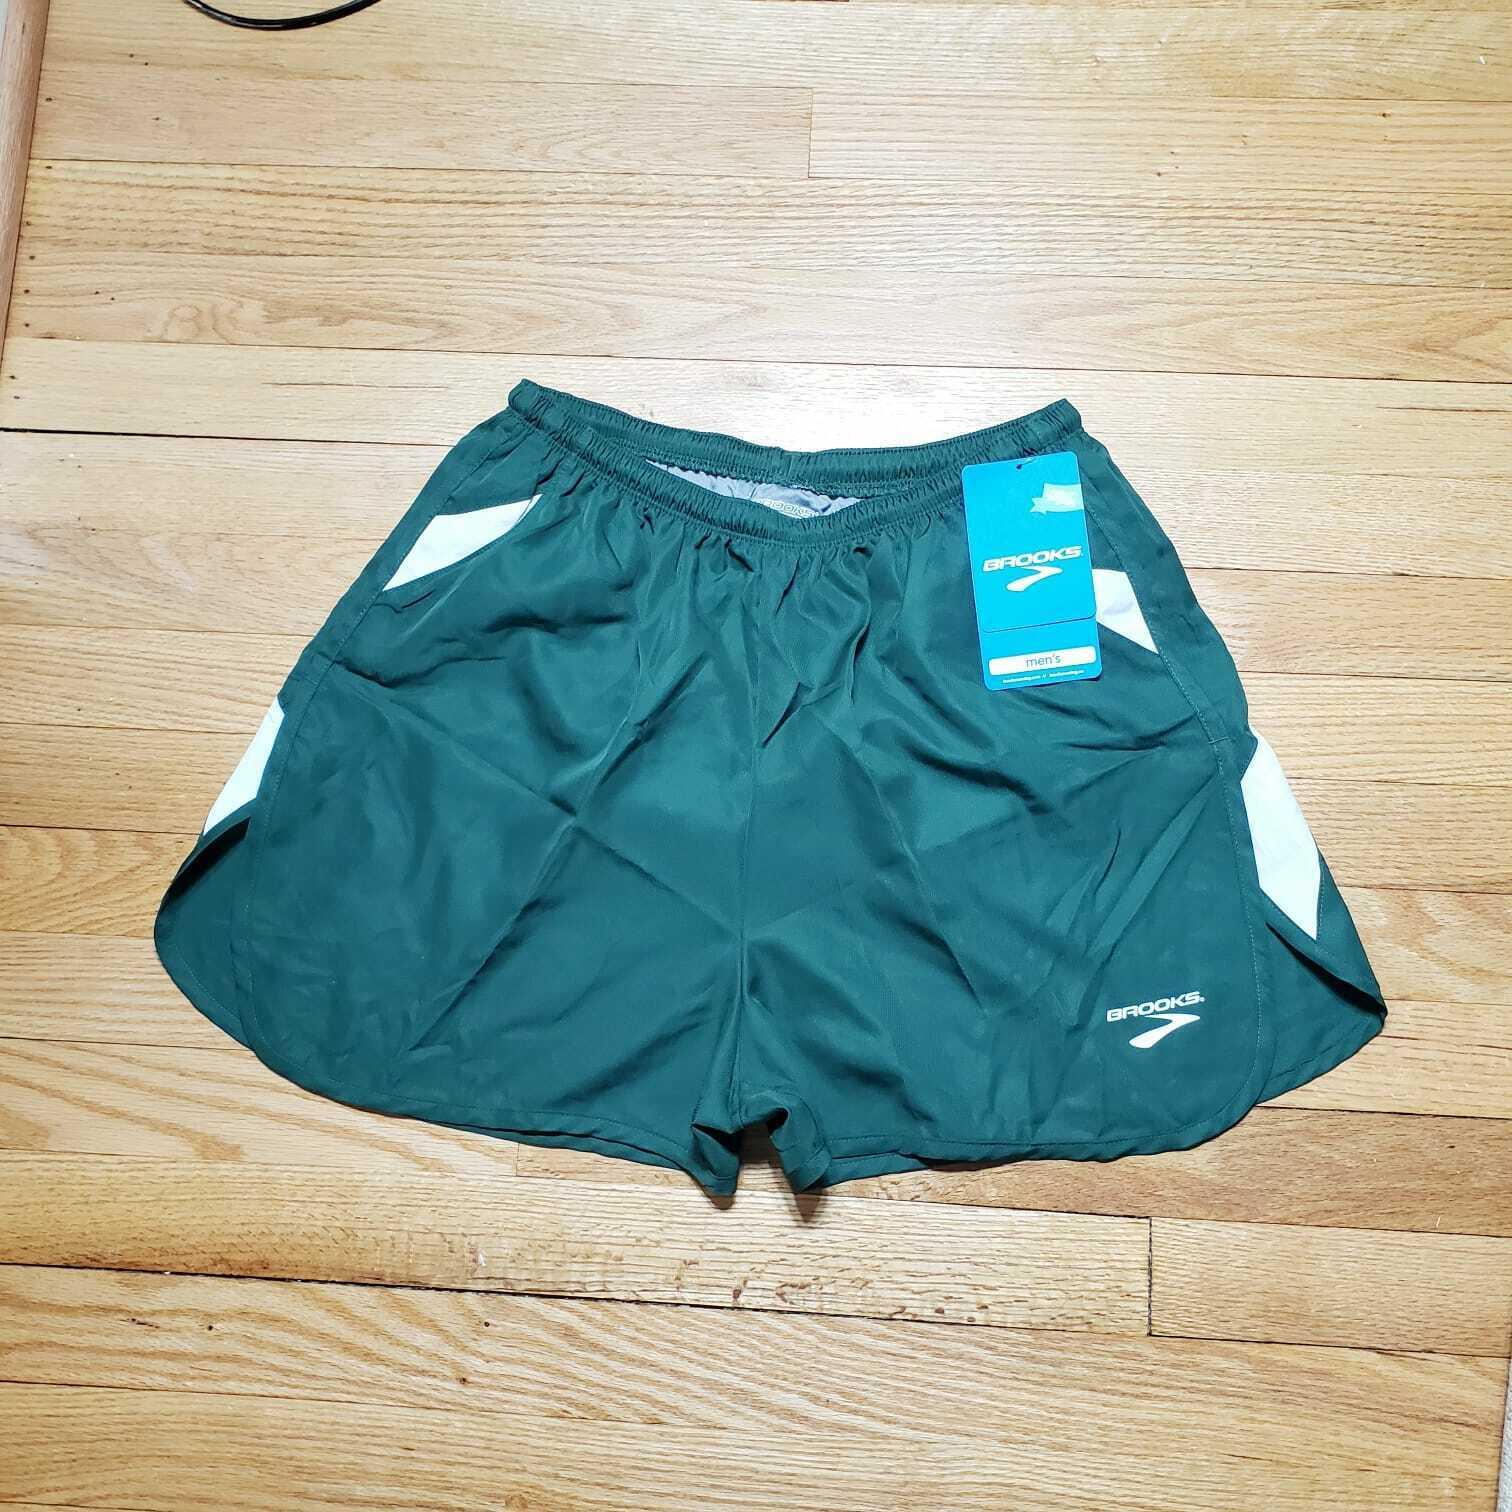 BROOKS Men's Running Black  Green Built-in Briefs Athletic